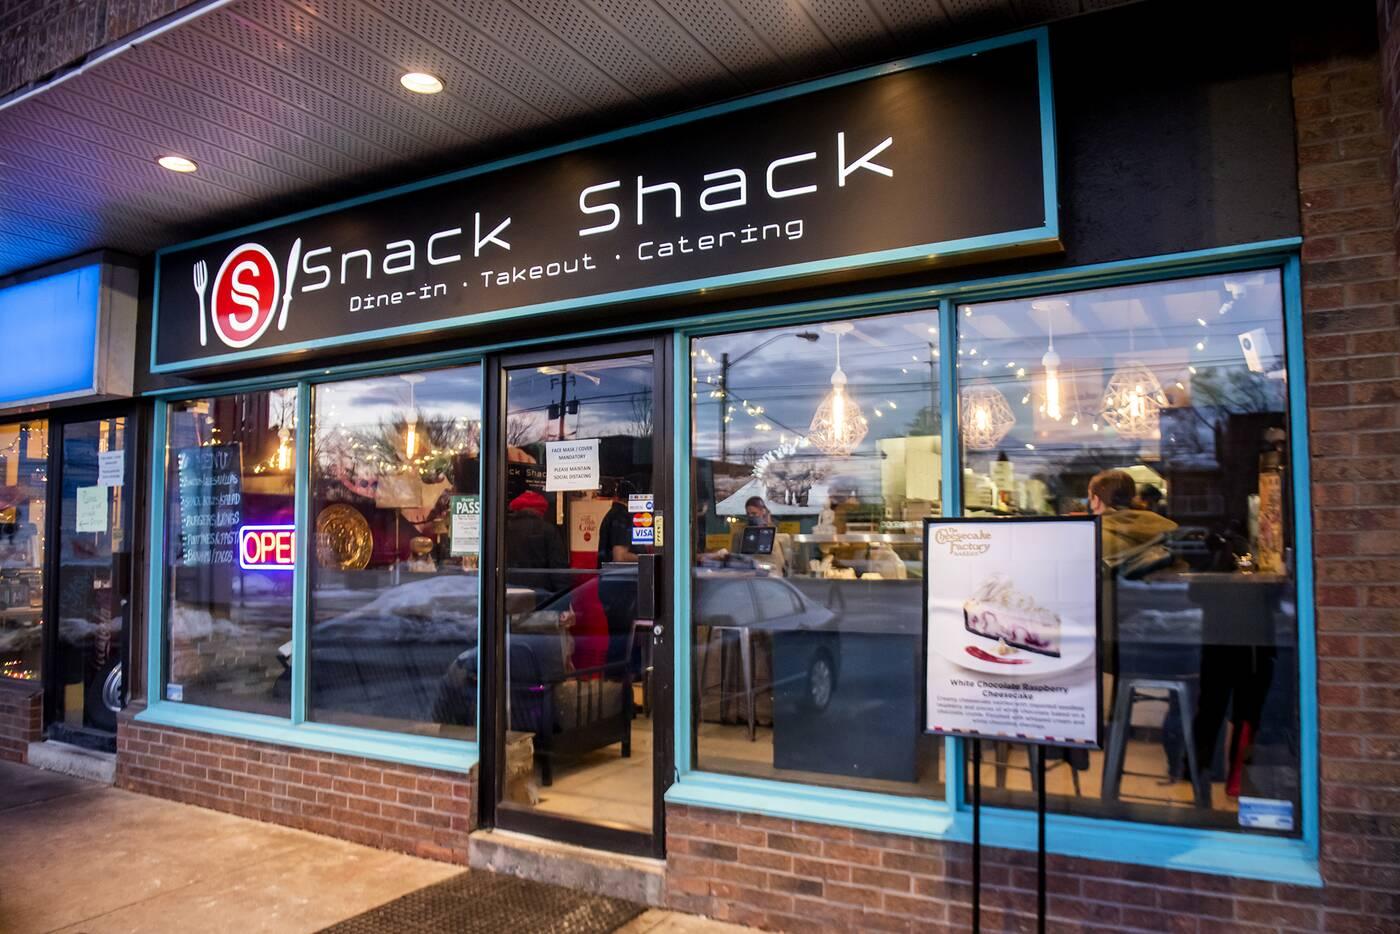 snack shack toronto